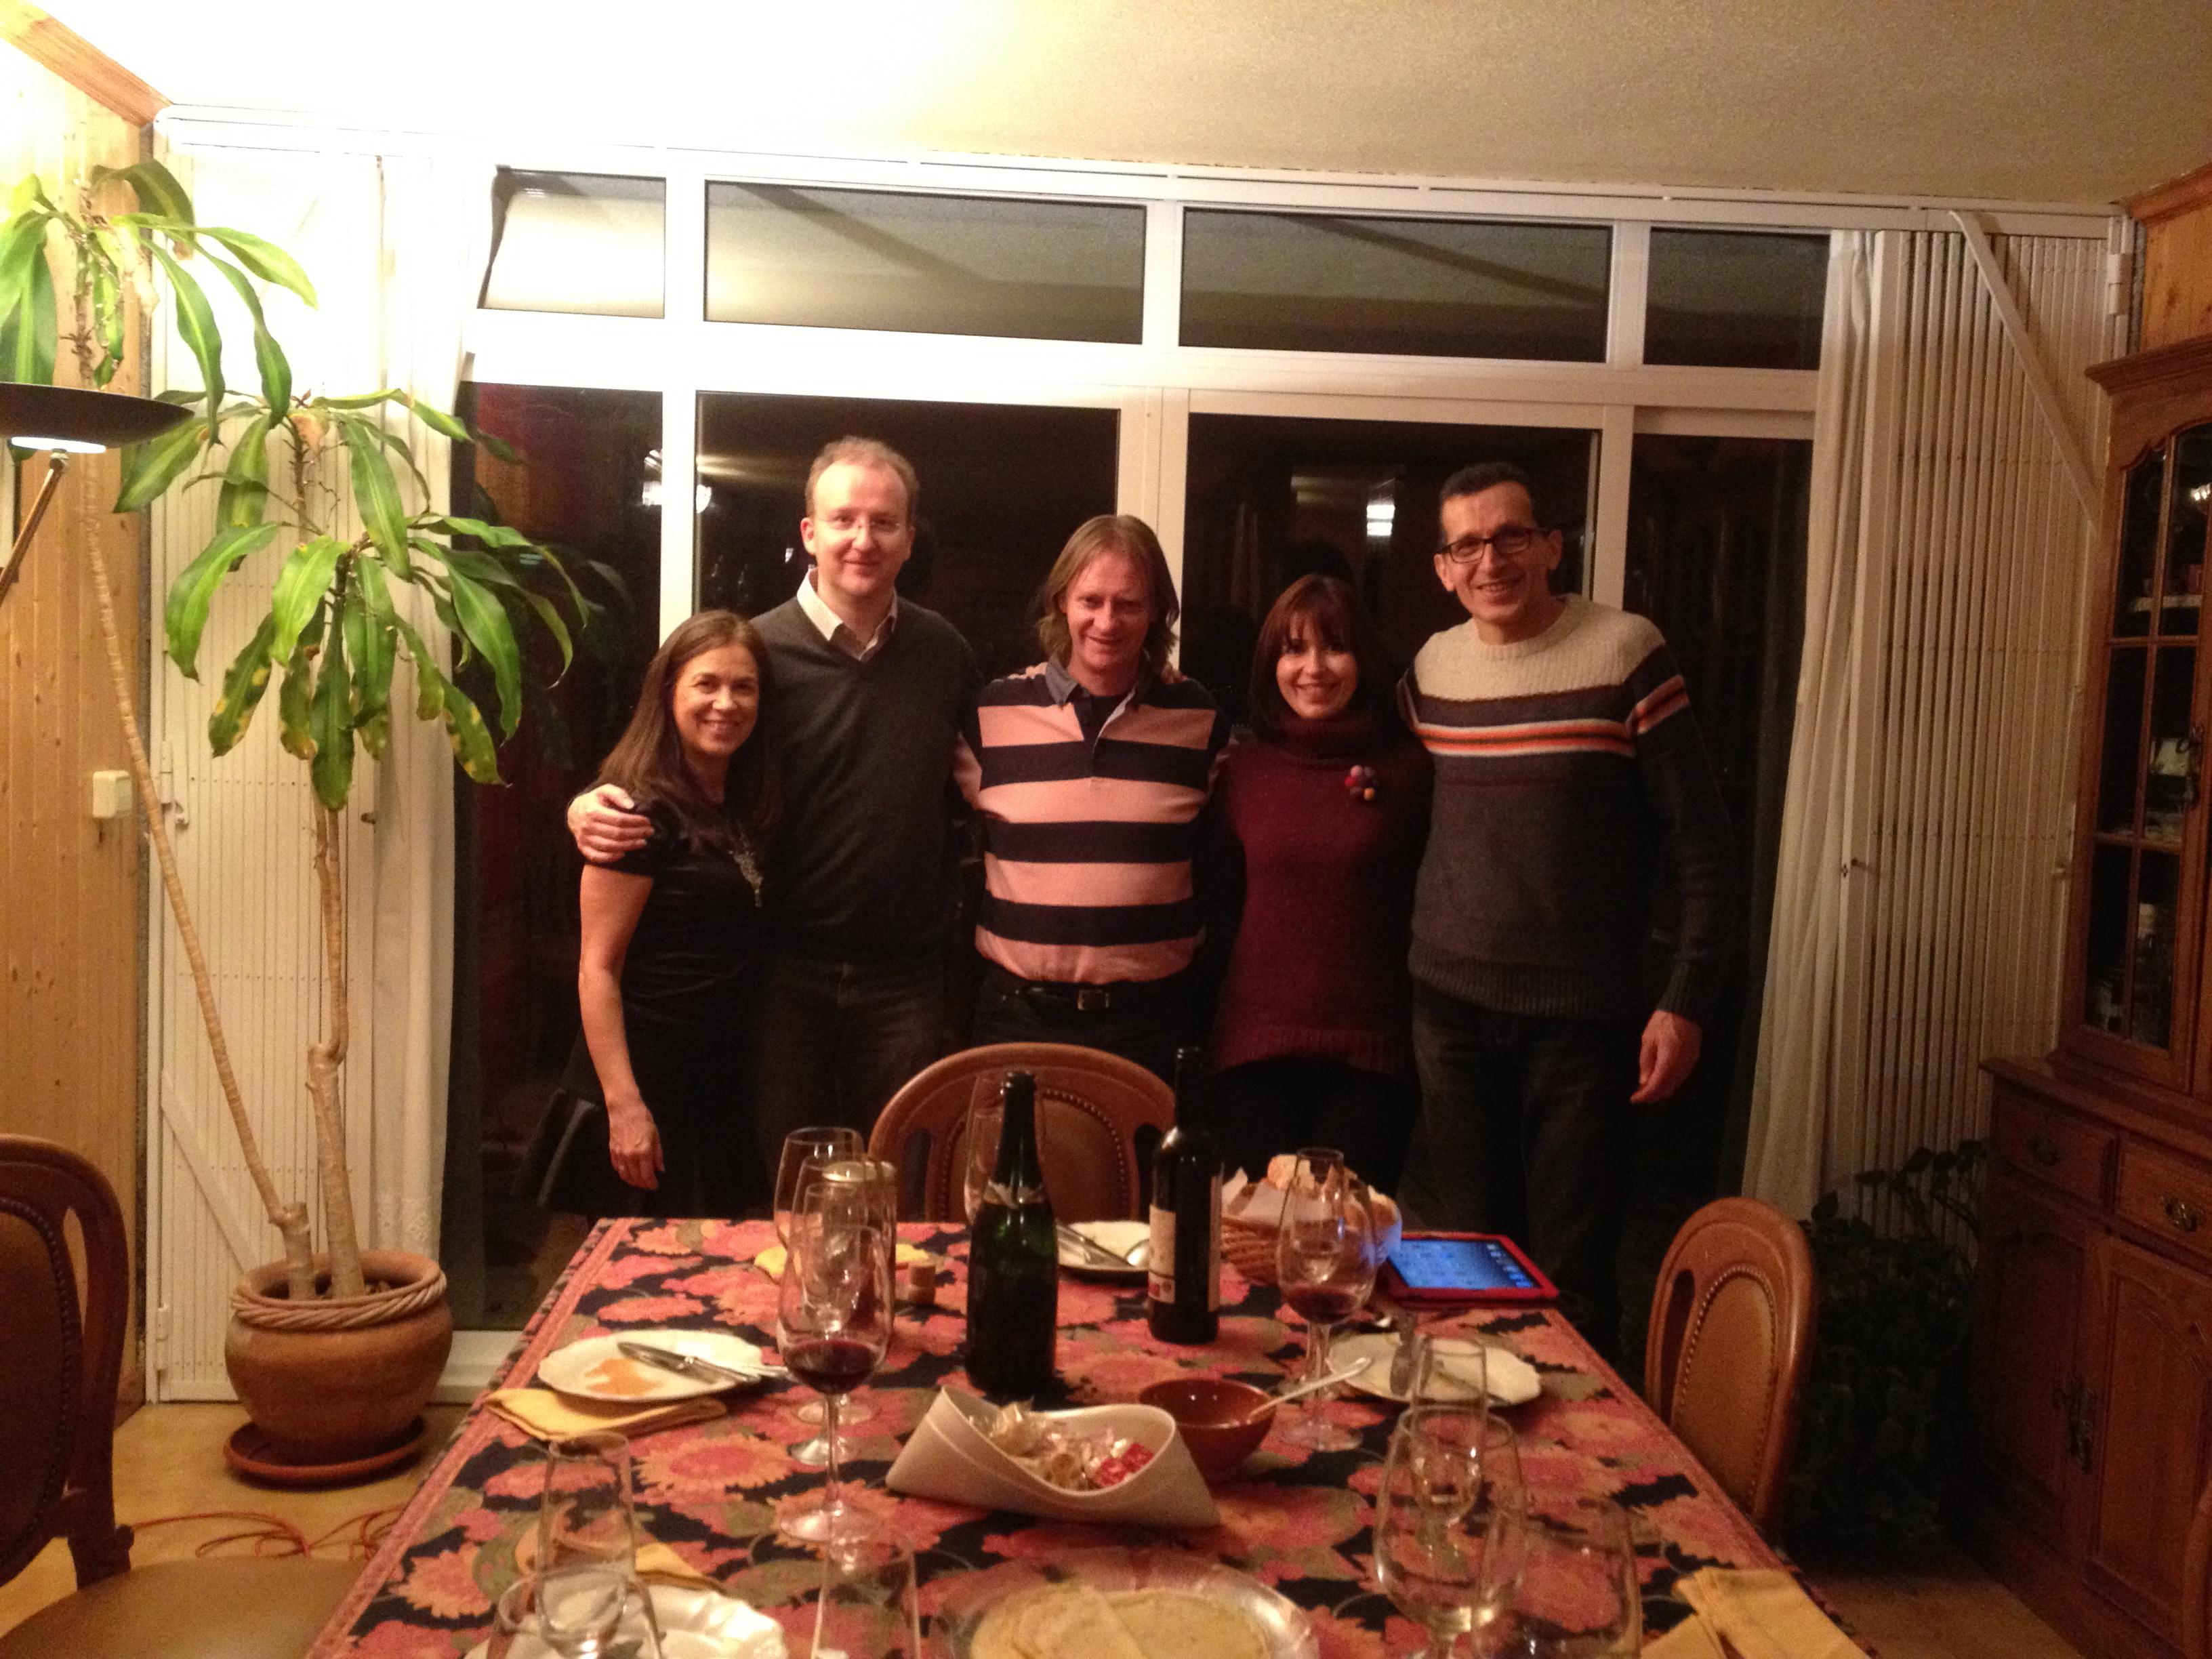 David, Maria, Roman and Margarita